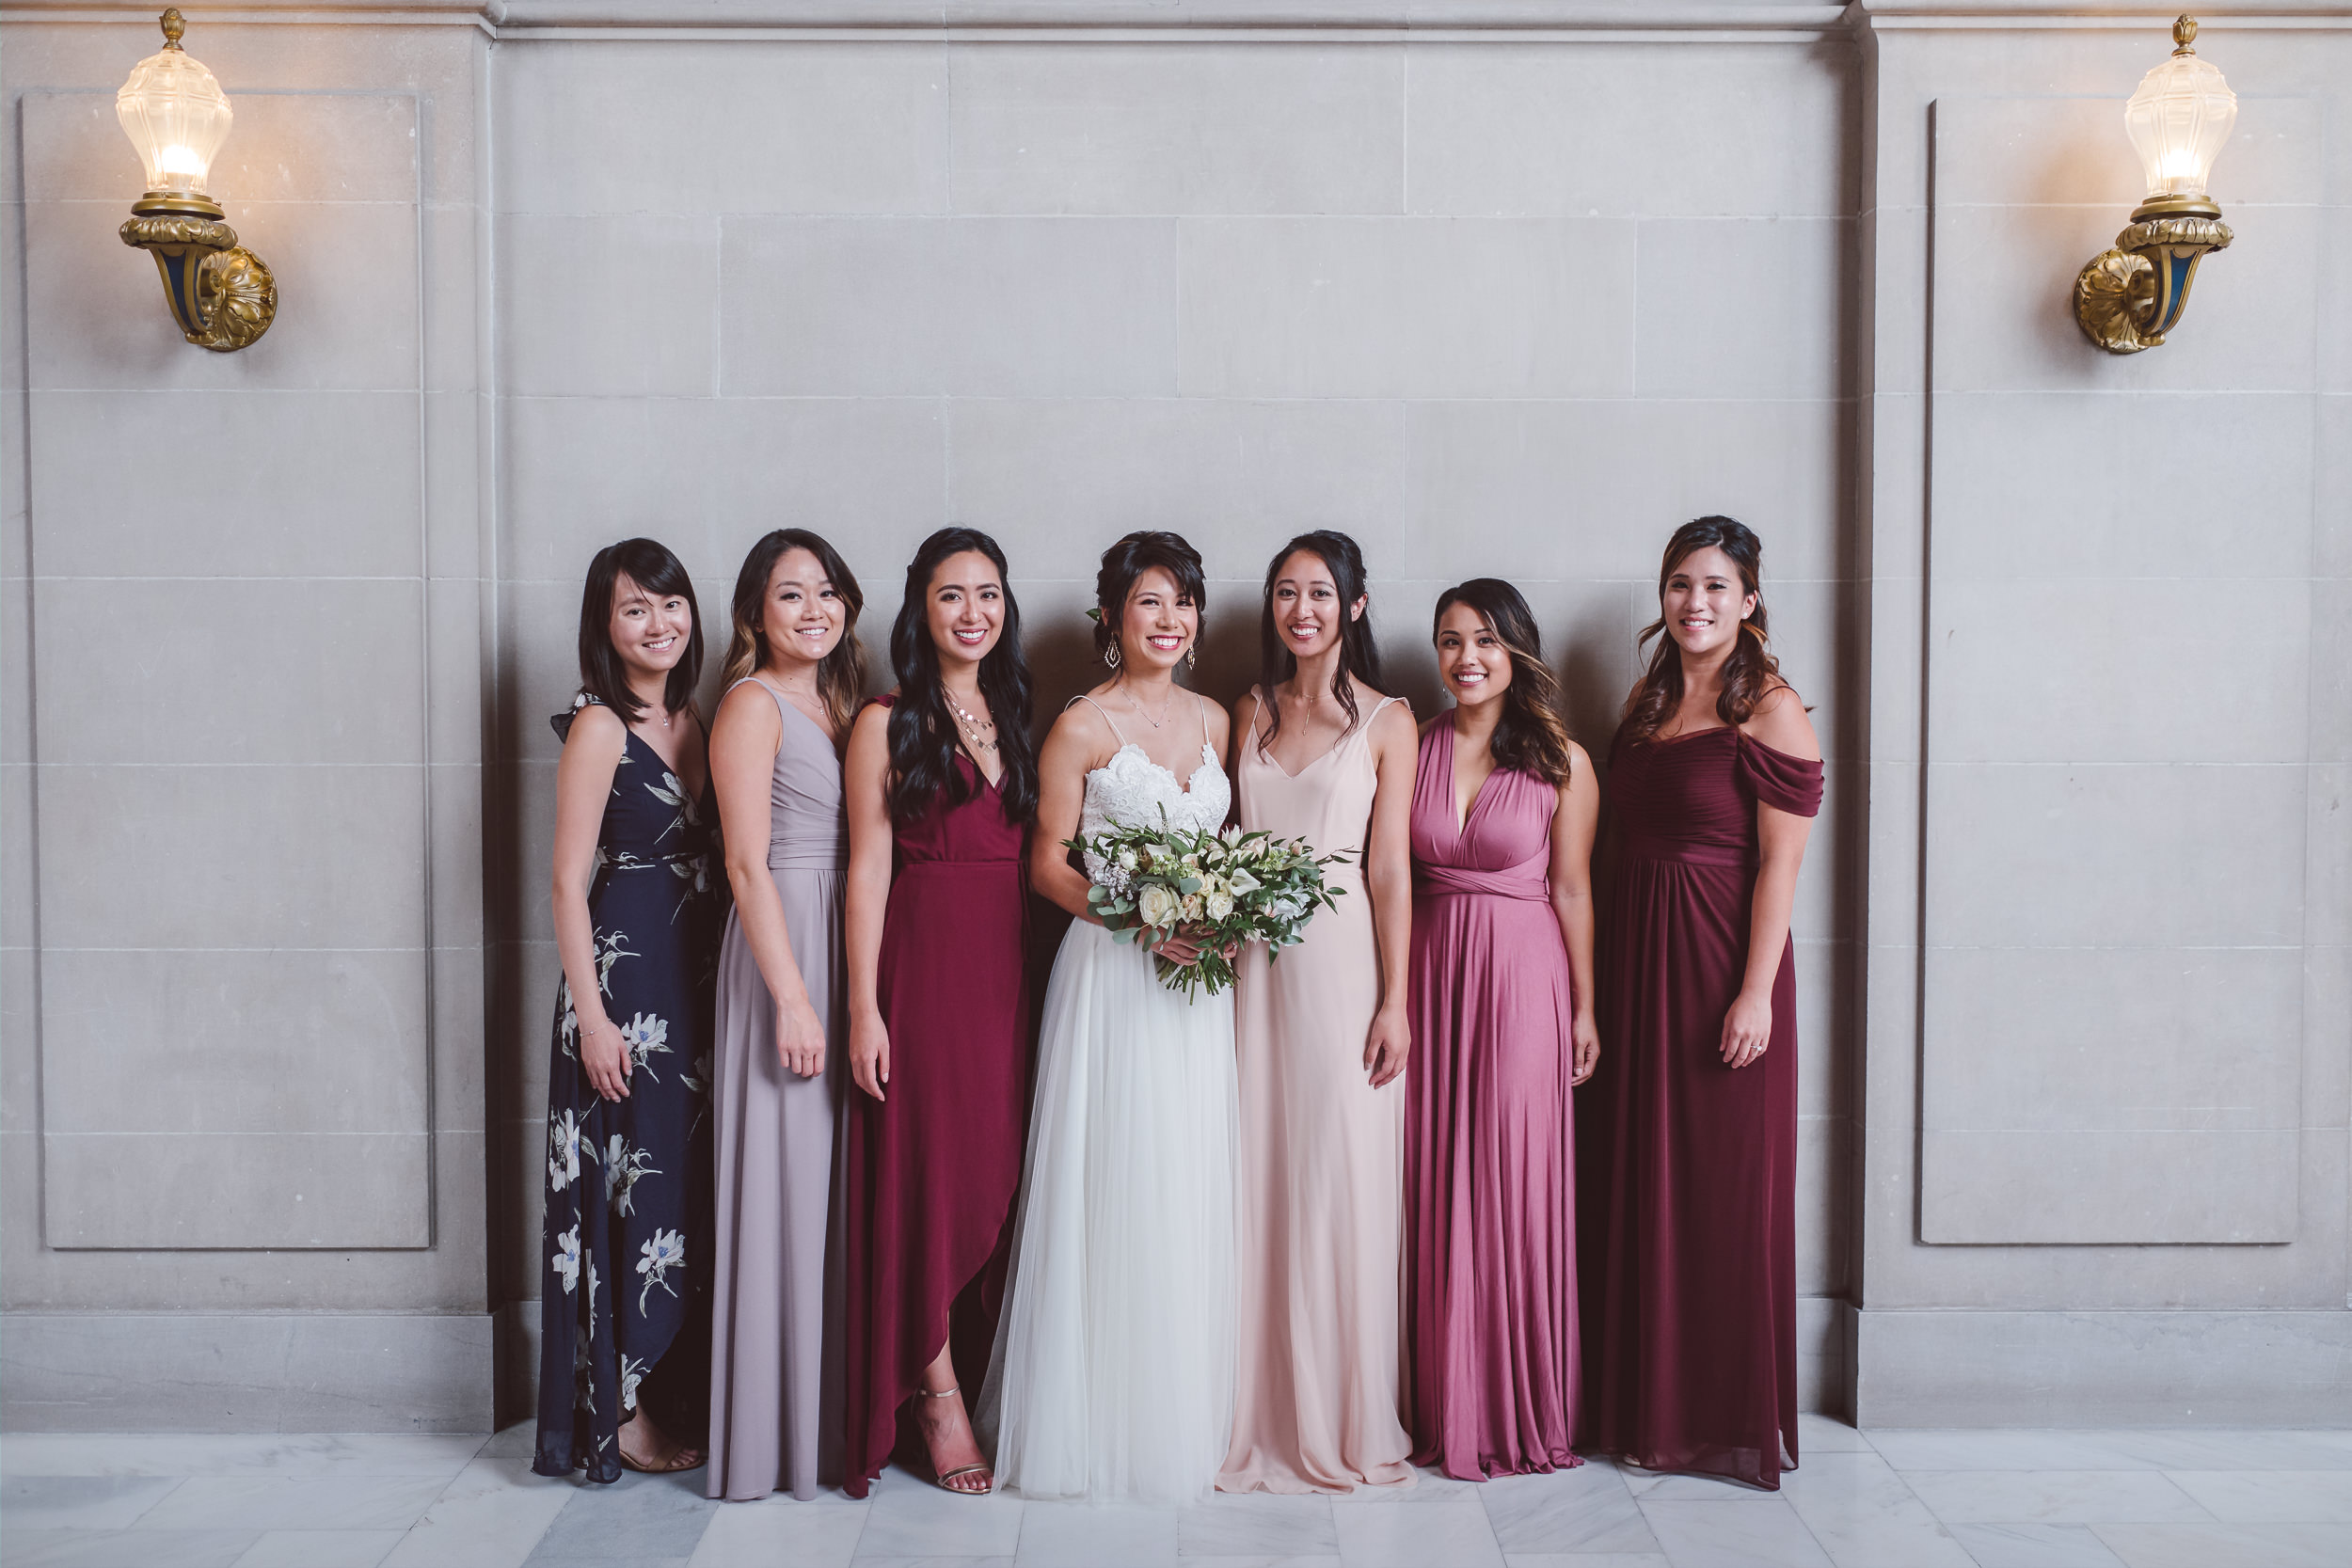 San-Francisco-City-Hall-Wedding-Photography-056.jpg